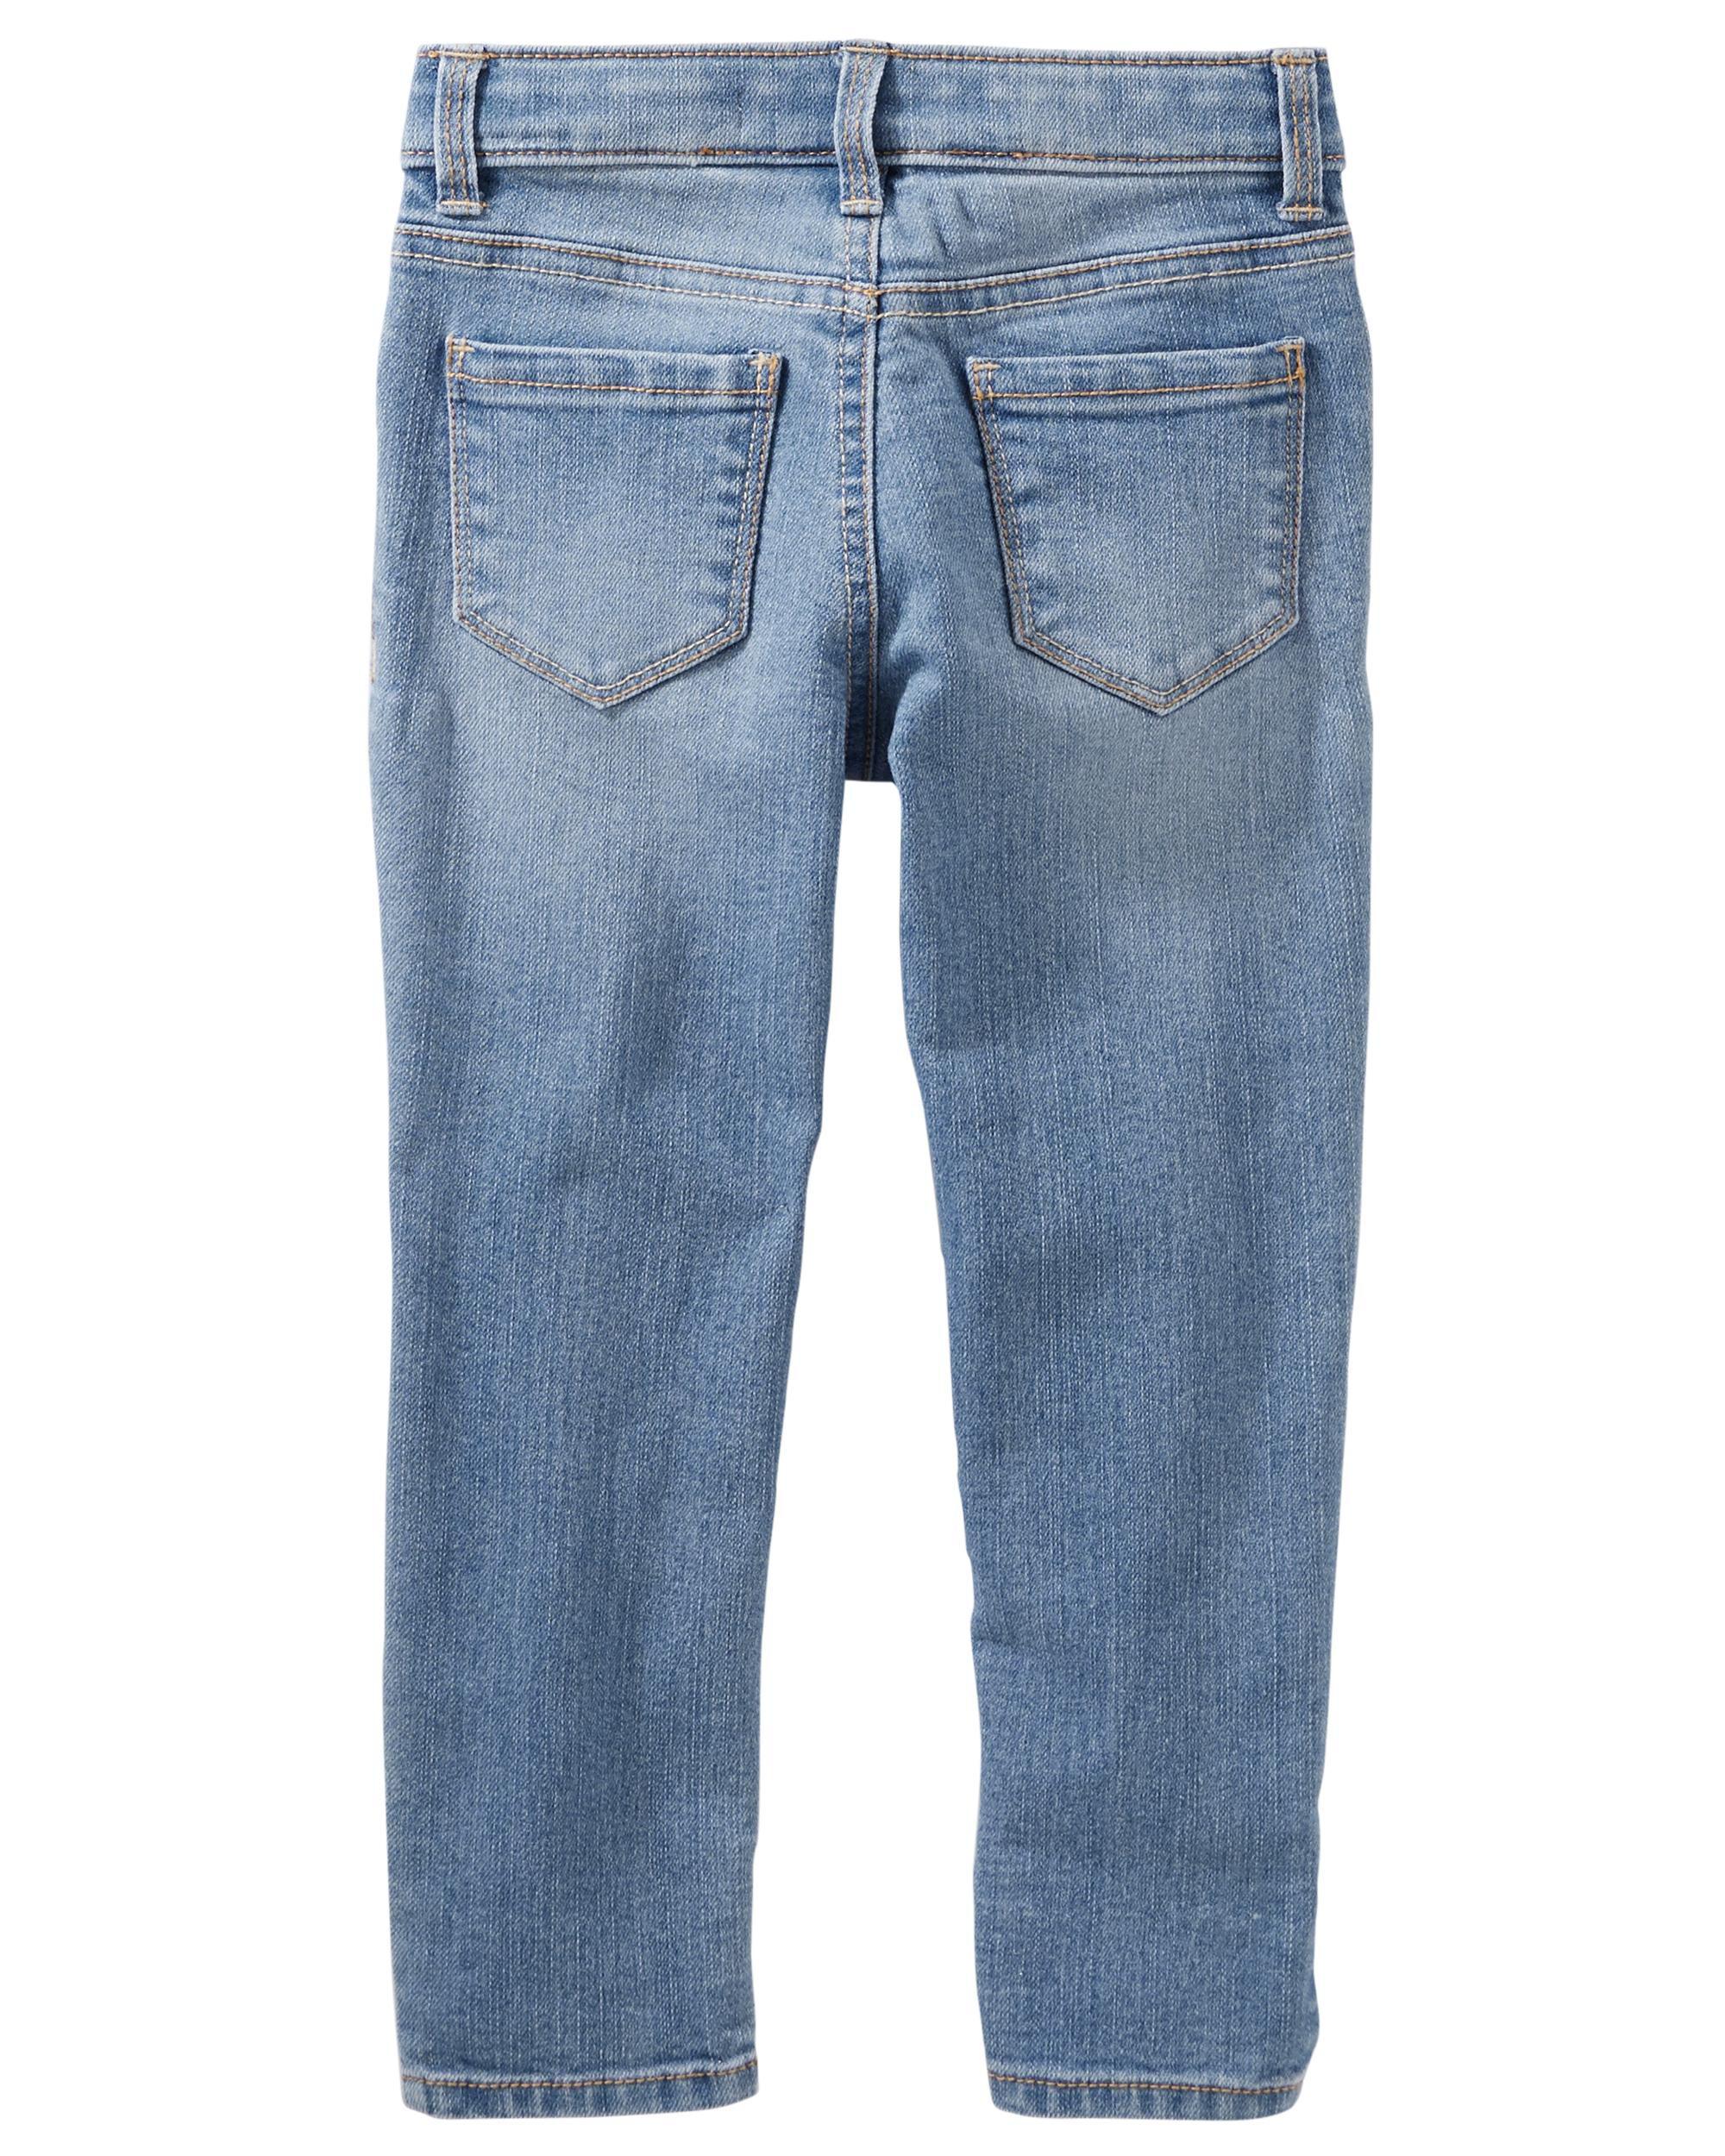 Super Skinny Jeans - Winchester Wash | OshKosh.com